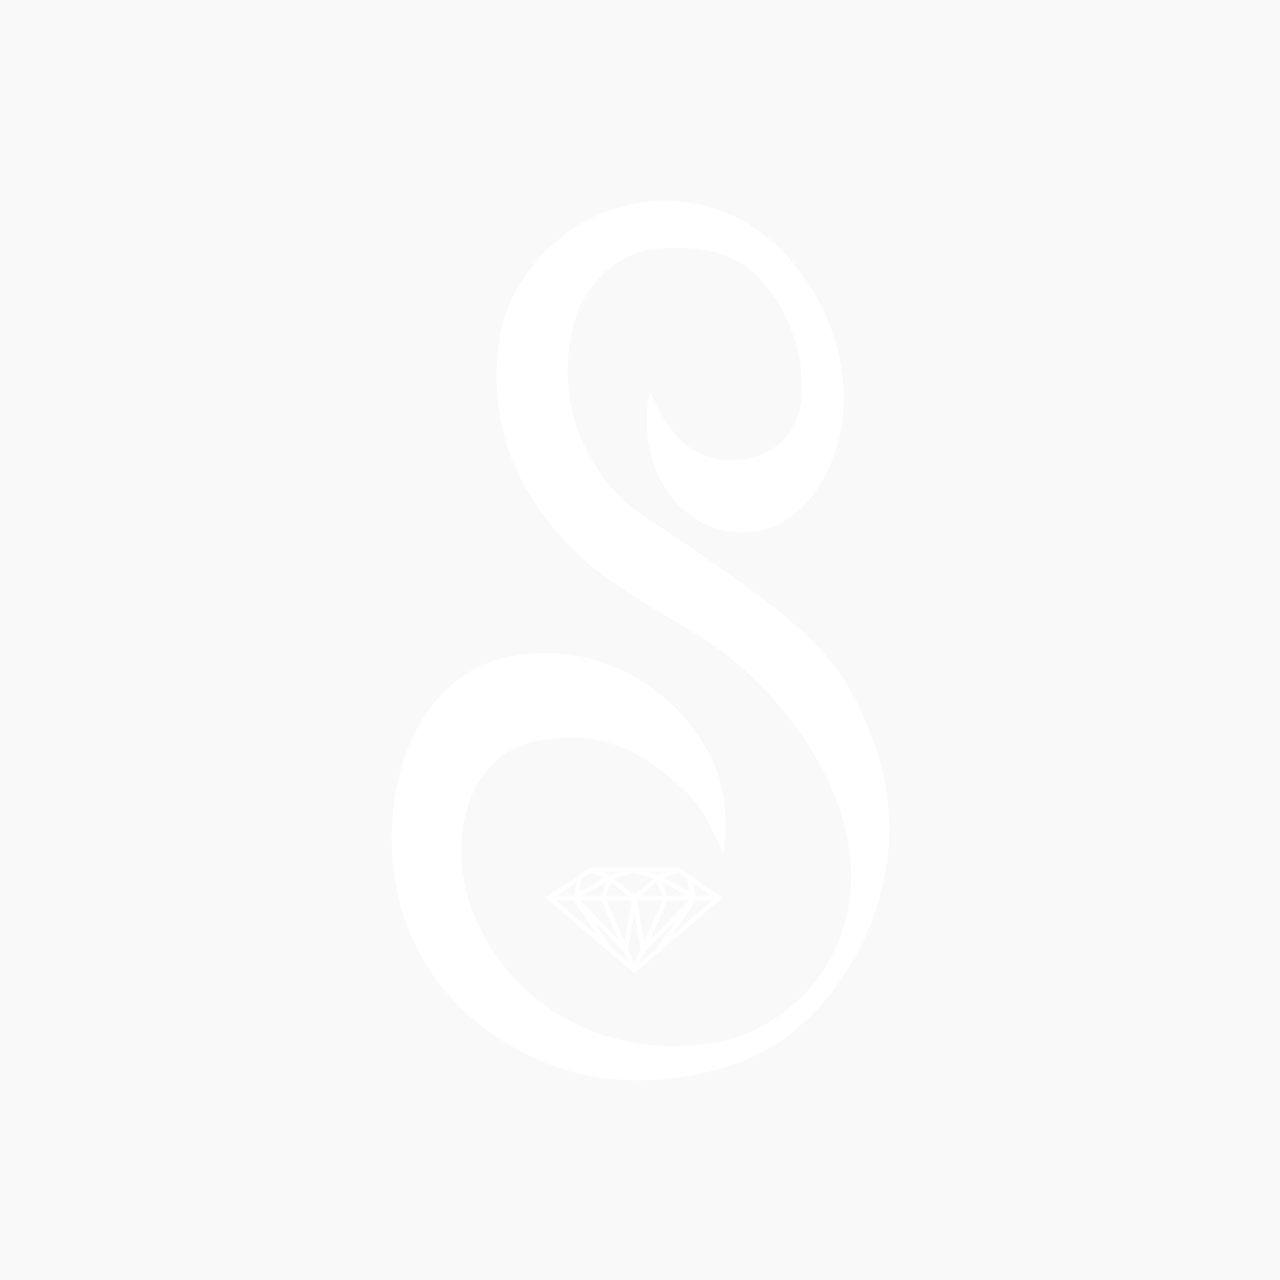 Omega 424.23.40.20.58.001 Champange Dial Watch